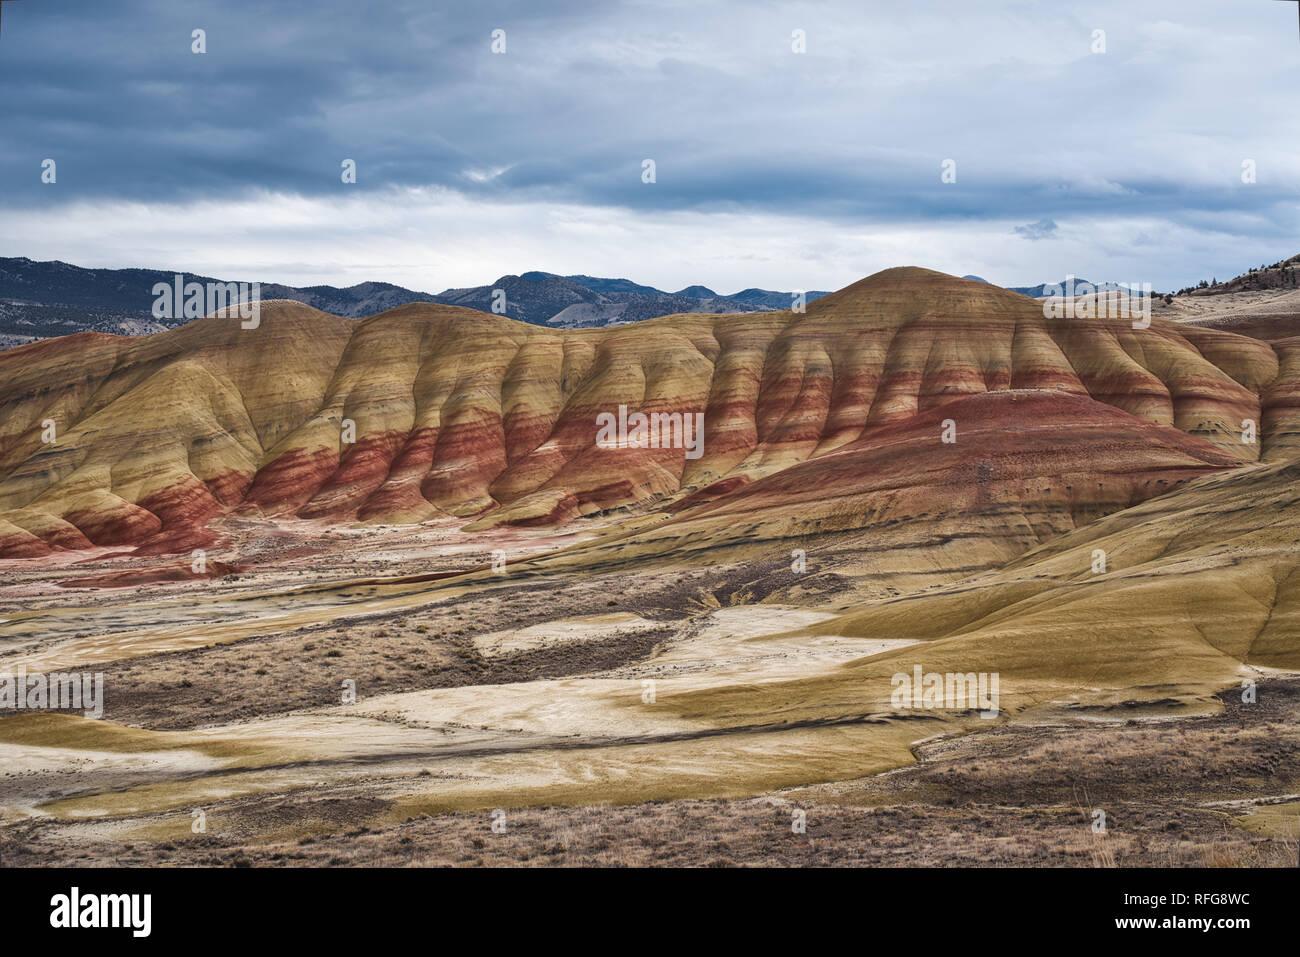 Foto der Painted Hills im Staat Oregon Stockfoto